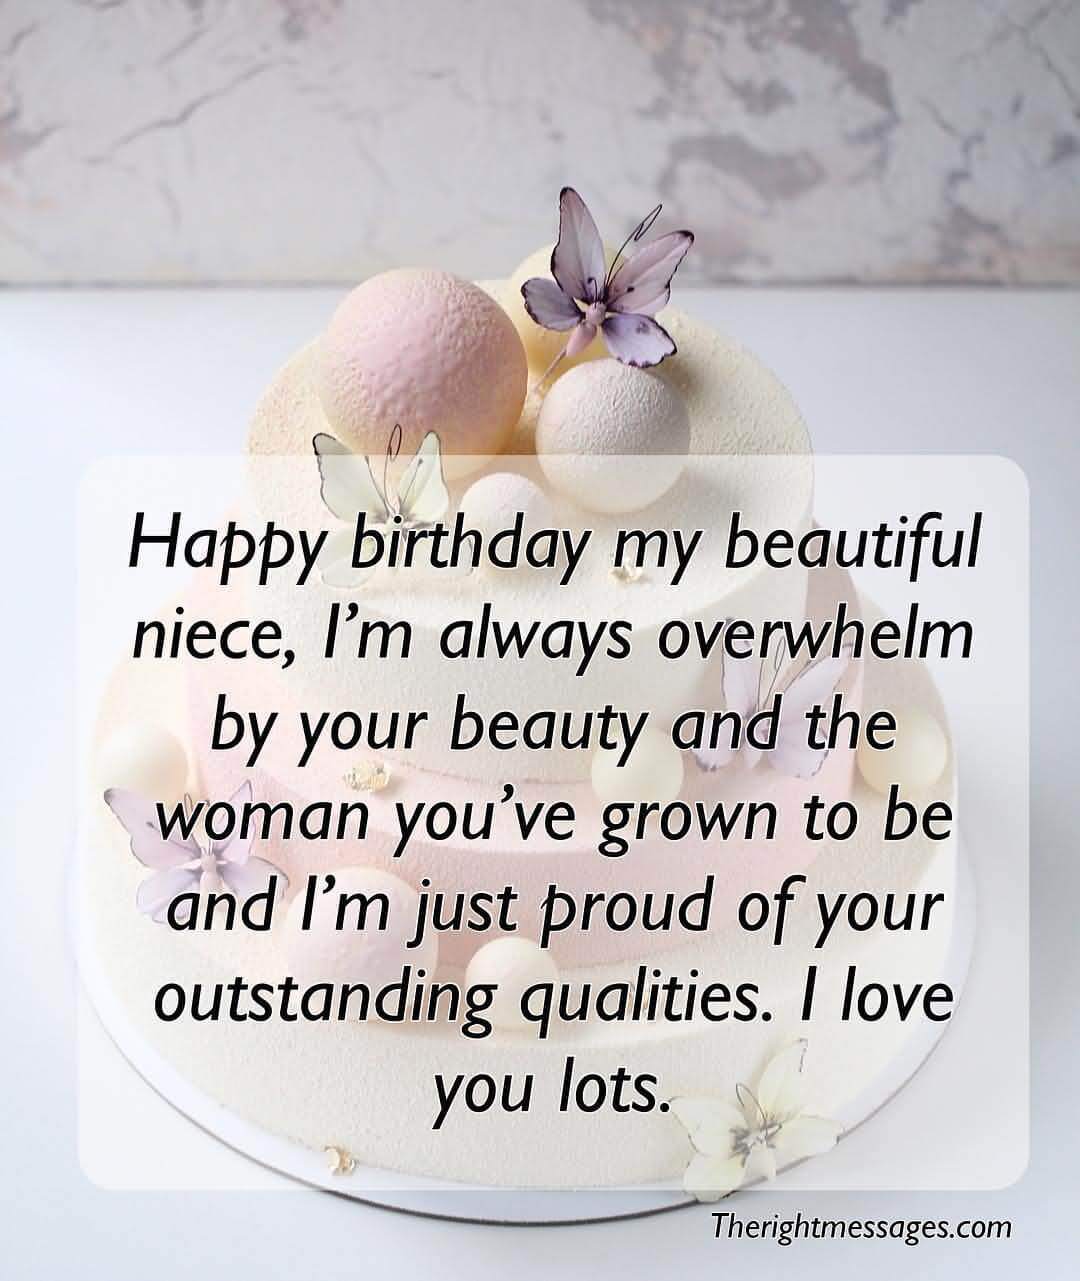 I Love You Lots Happy Birthday Niece